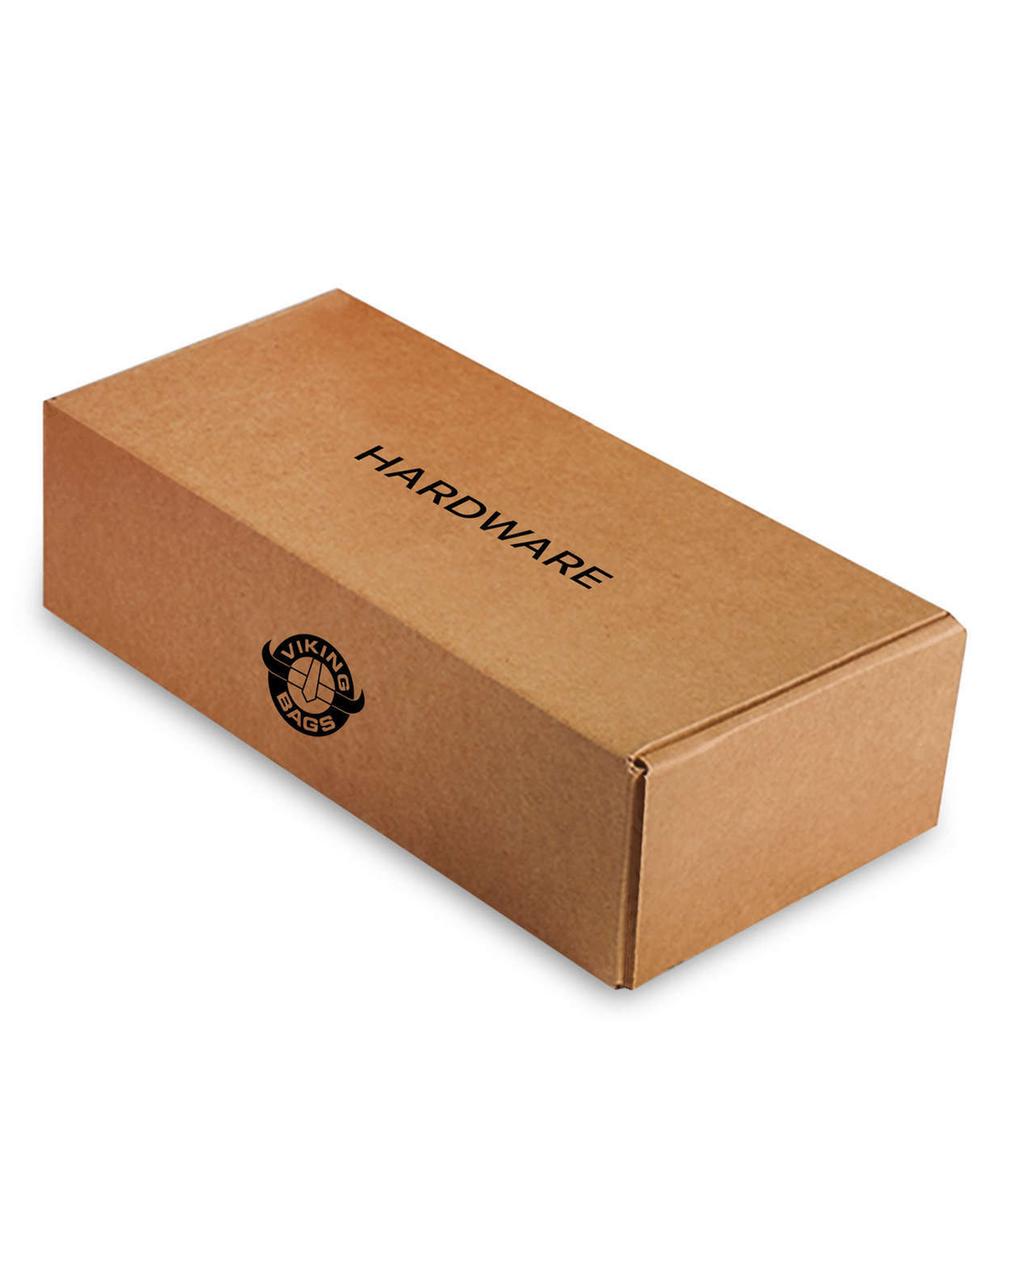 Honda 1500 Valkyrie Standard Side Pocket Motorcycle saddlebags Box